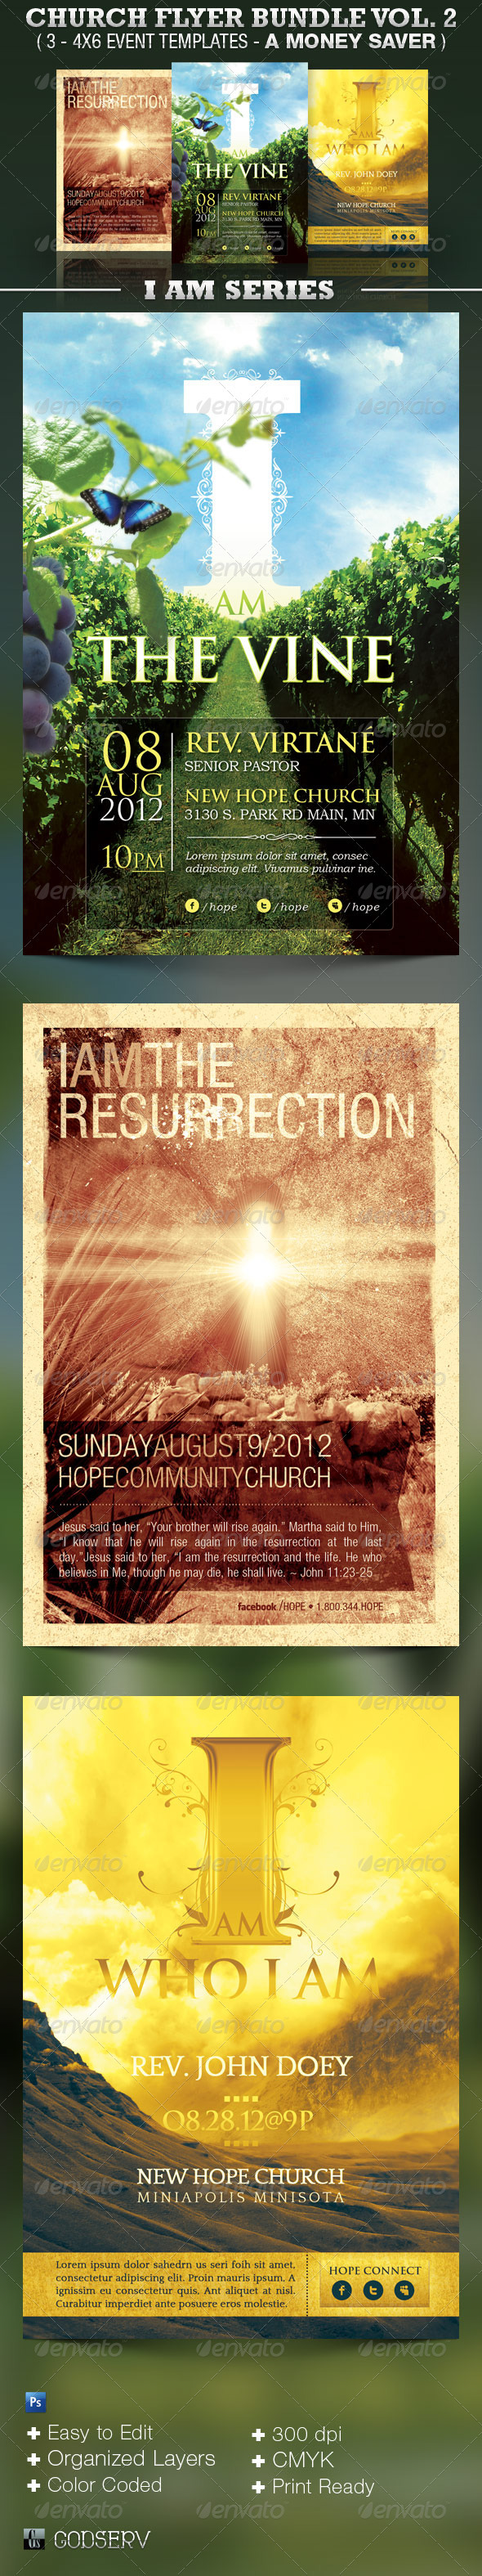 I Am Church Flyer Template Bundle Vol 2 - Church Flyers